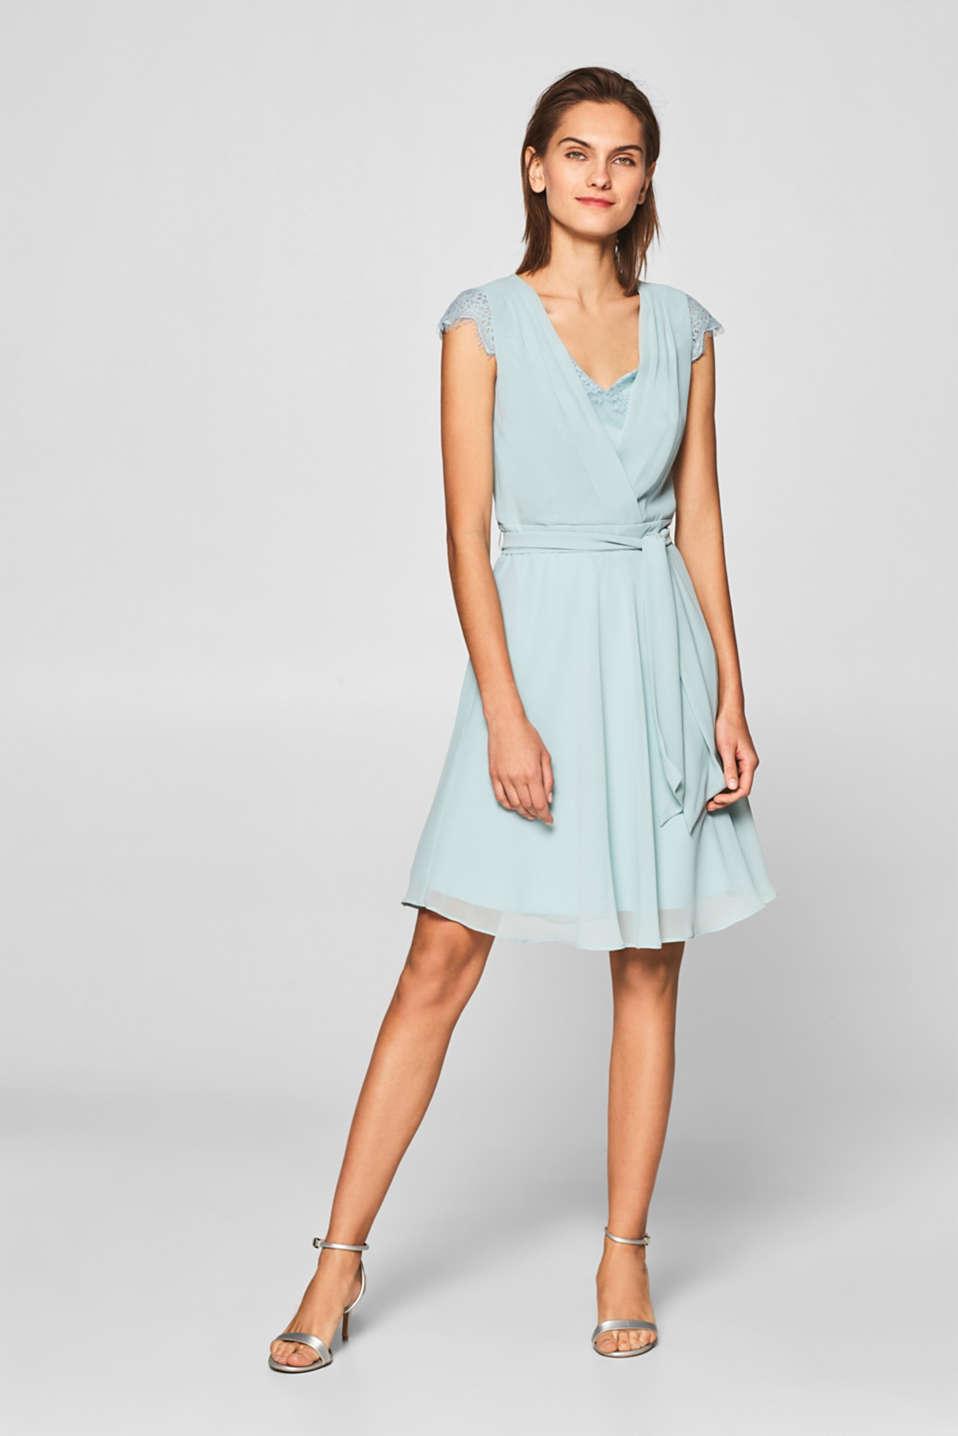 Esprit - Skir chiffongklänning med spetsdetaljer i Esprits Online-Shop f998059a2a3e4